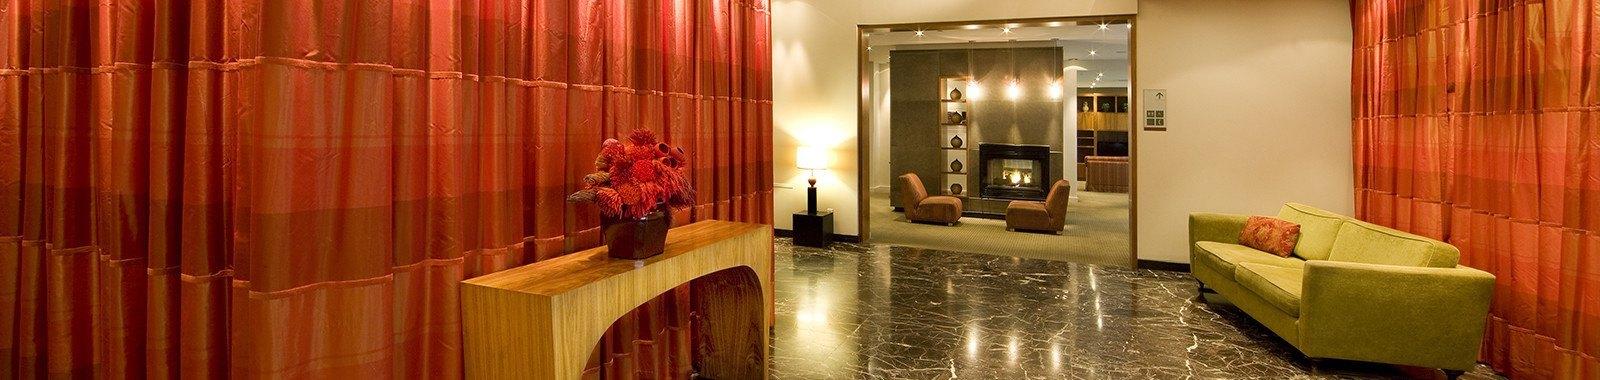 Residence Montreal' Lobby